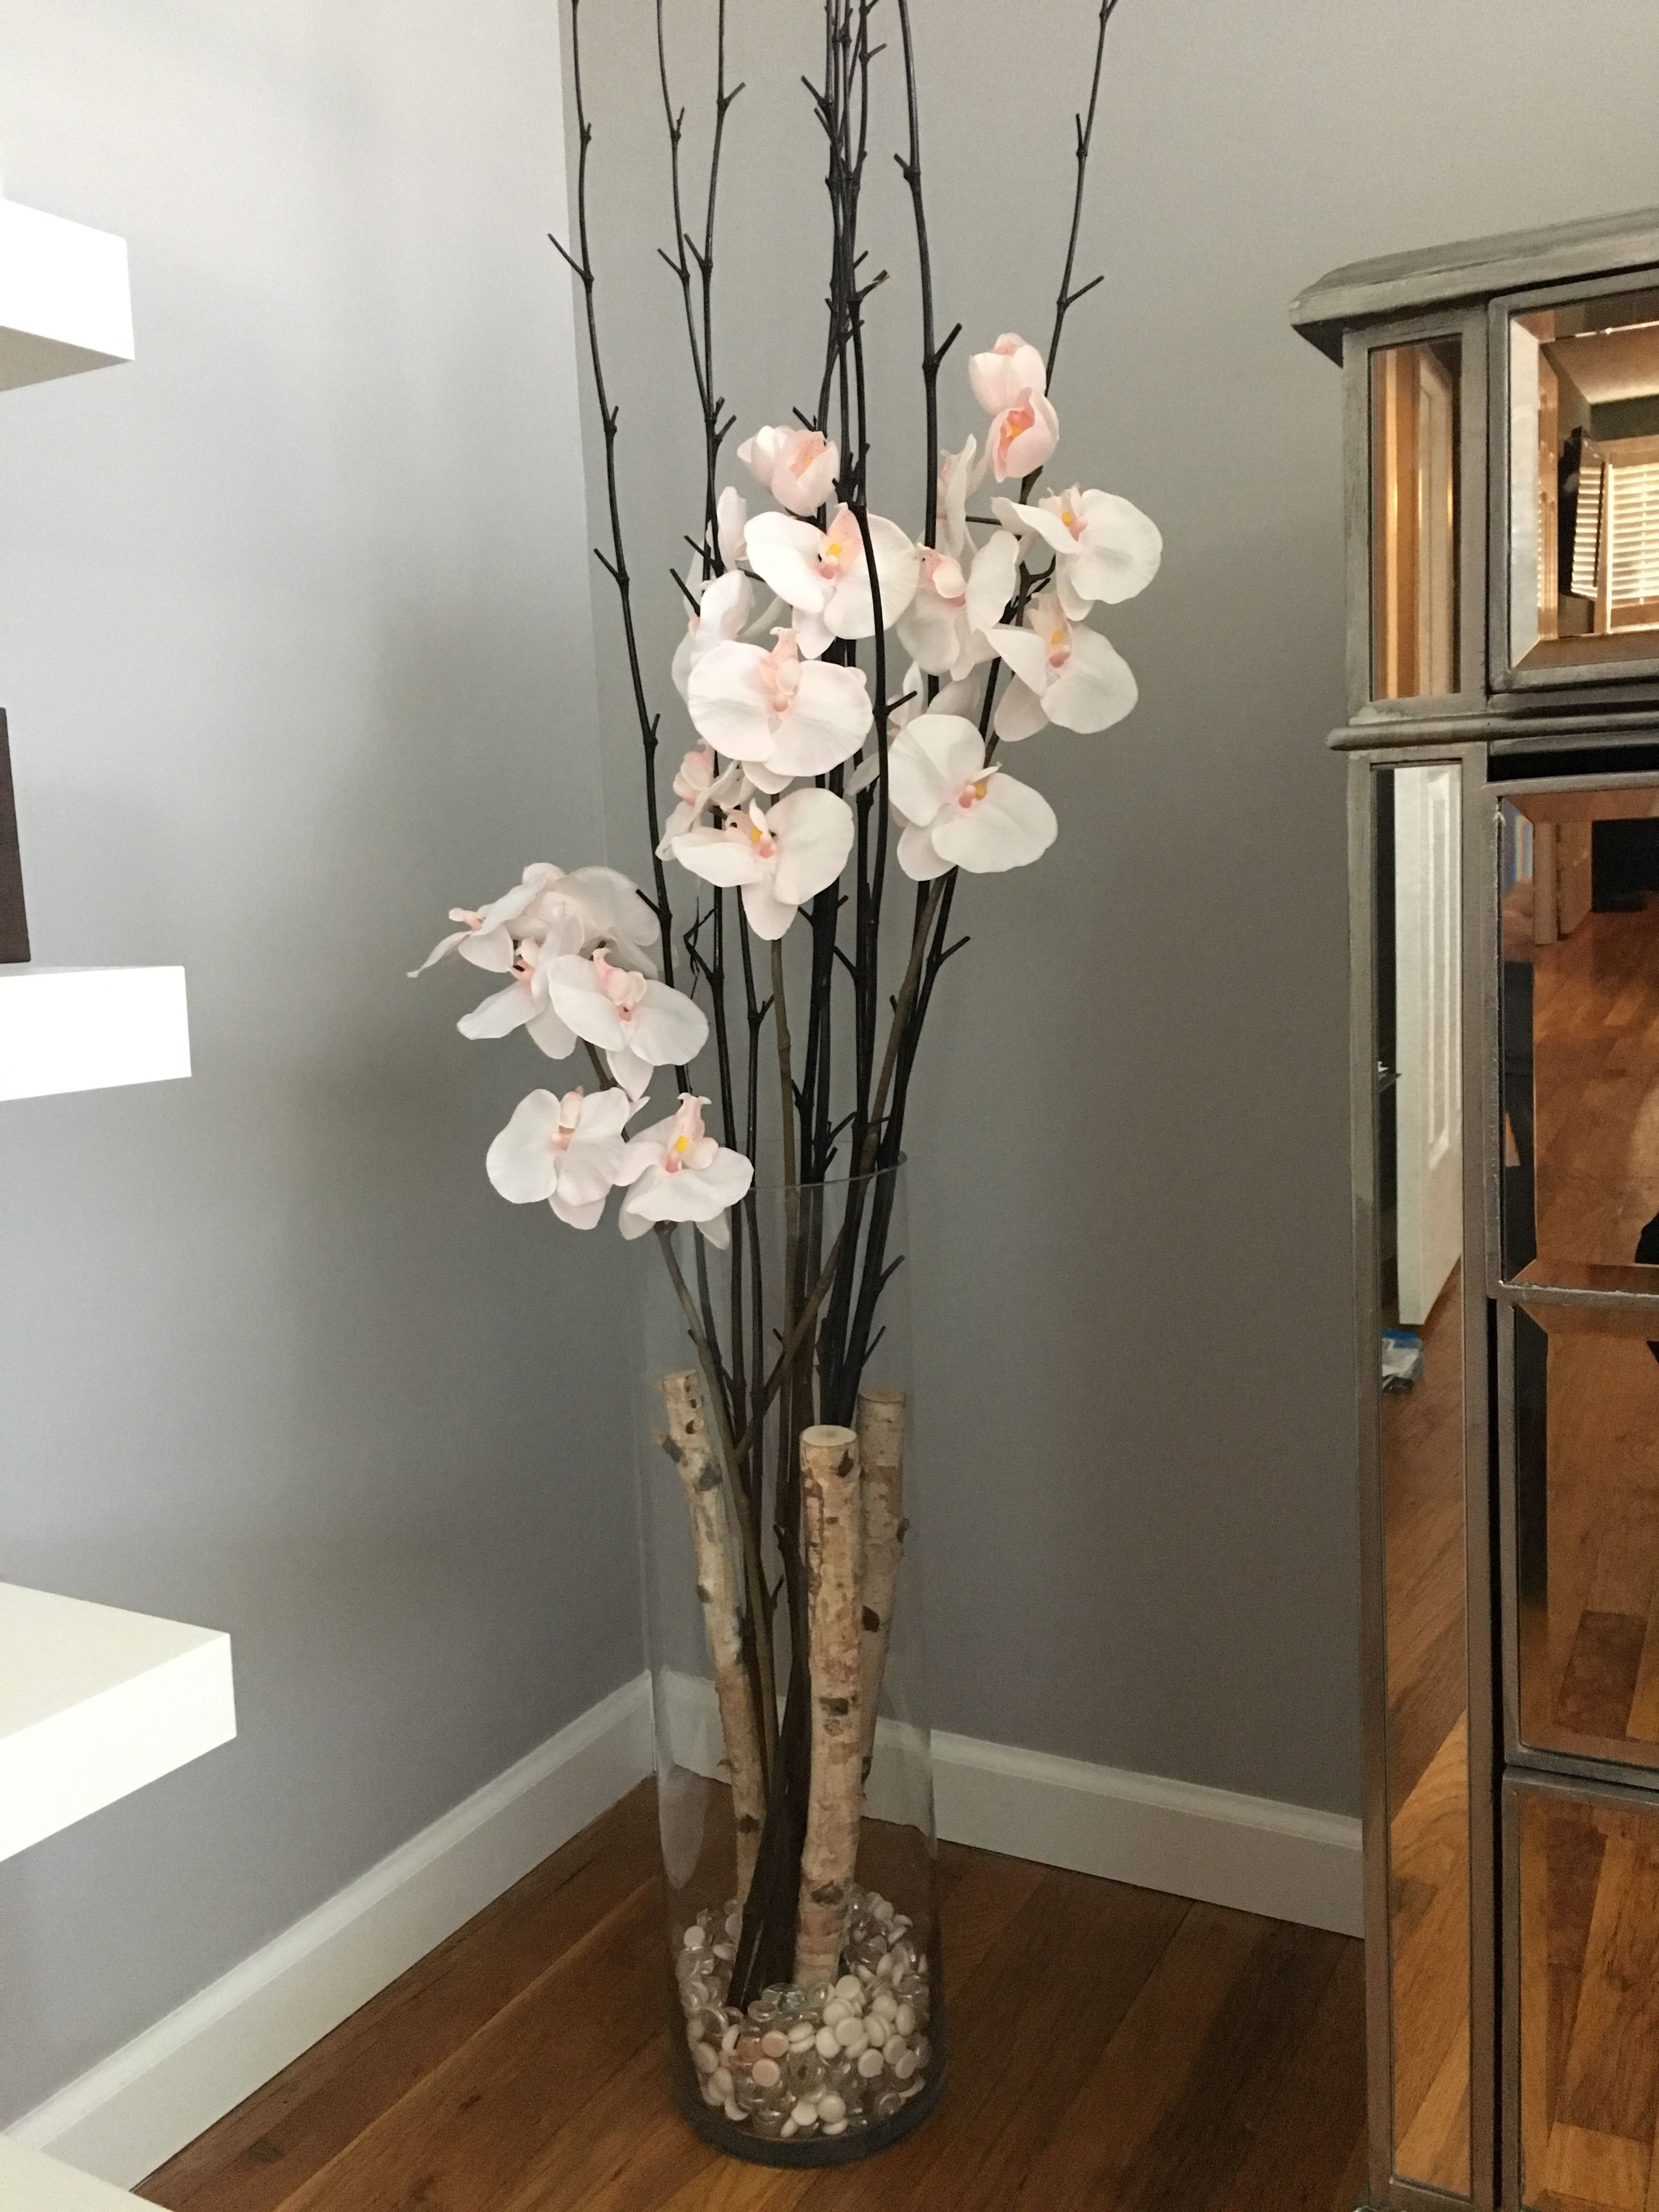 Orchid with Vase Of 20 Elegant Large Floor Vase Decoration Ideas Bogekompresorturkiye Com within orchid Flower Floor Vase Crafty Diy Decor